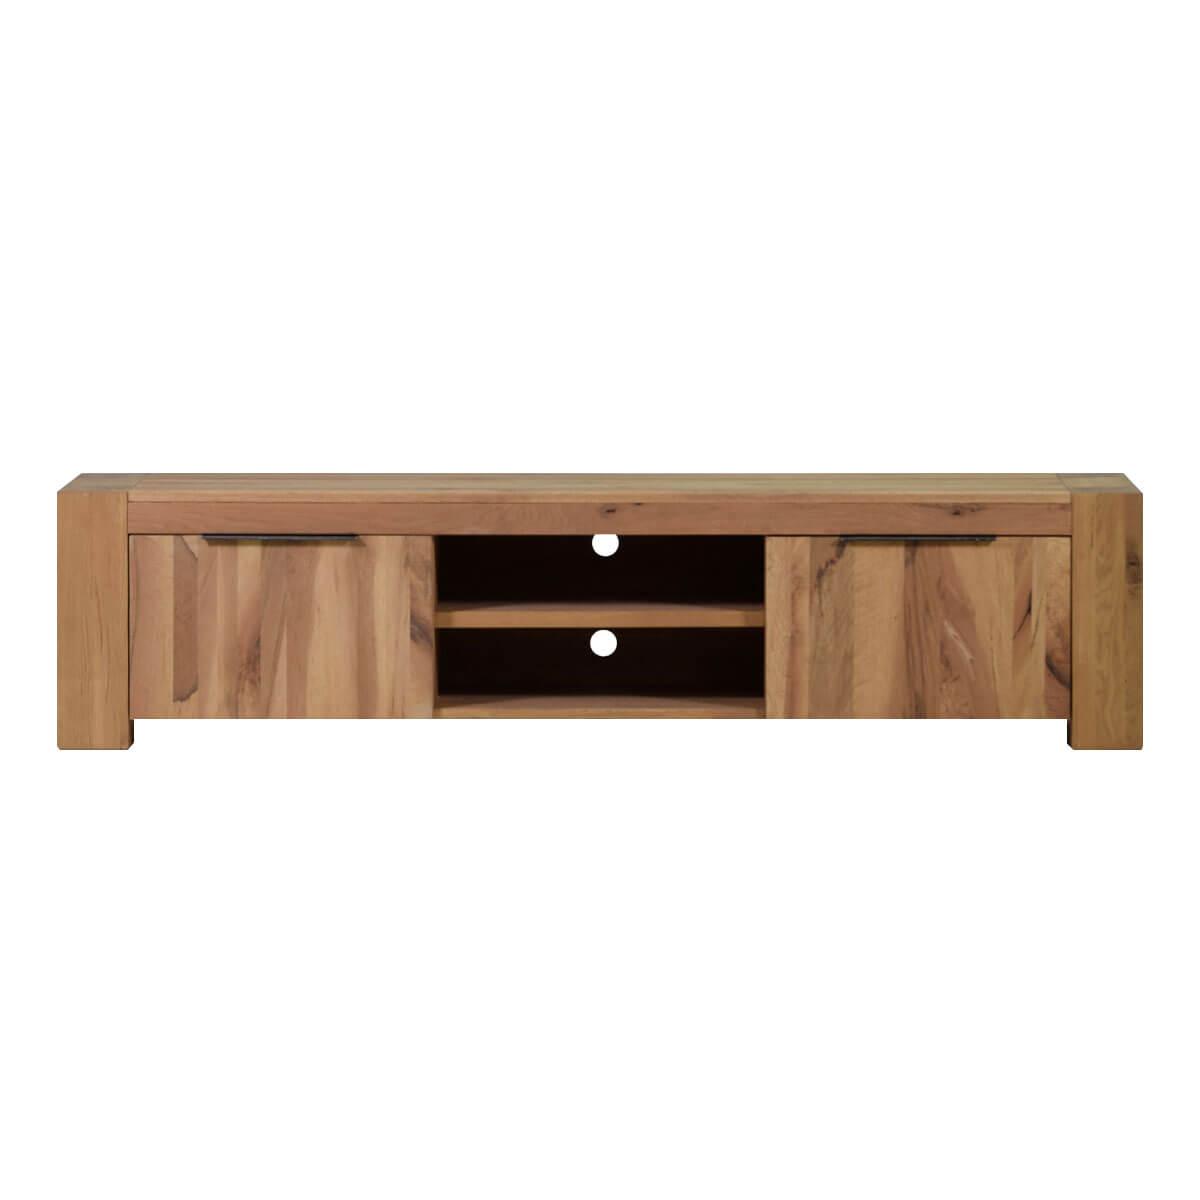 tv lowboard in eiche tv board natur fernsehtisch massivm bel 210 cm neu ebay. Black Bedroom Furniture Sets. Home Design Ideas